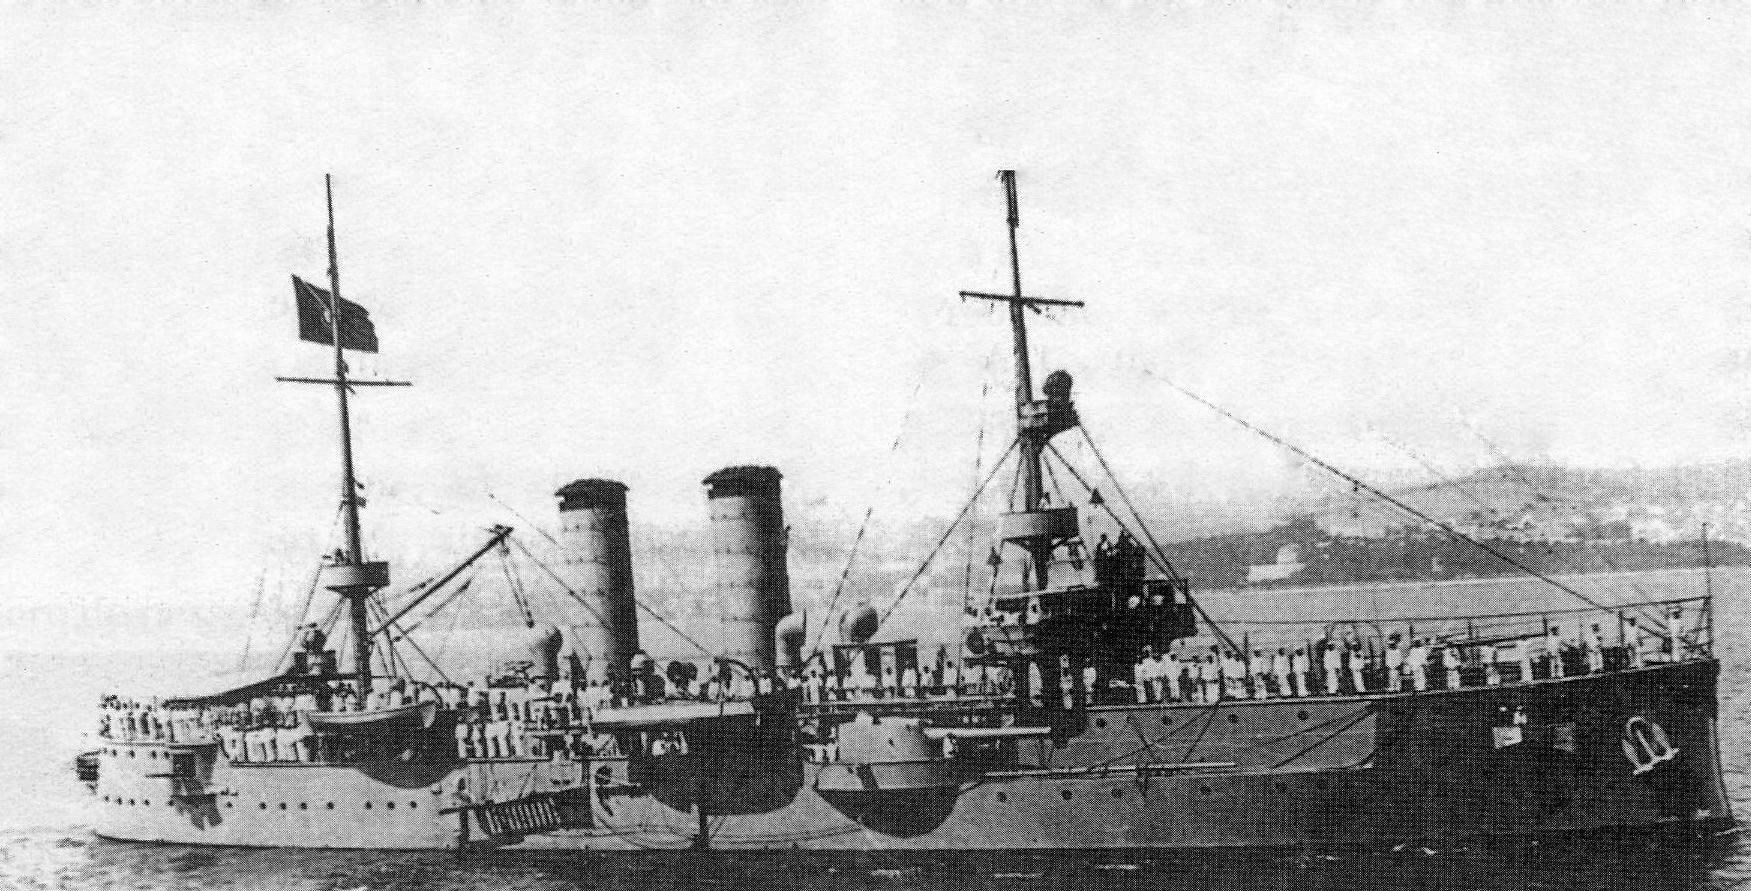 Coastal Battleship Vasco Da Gama